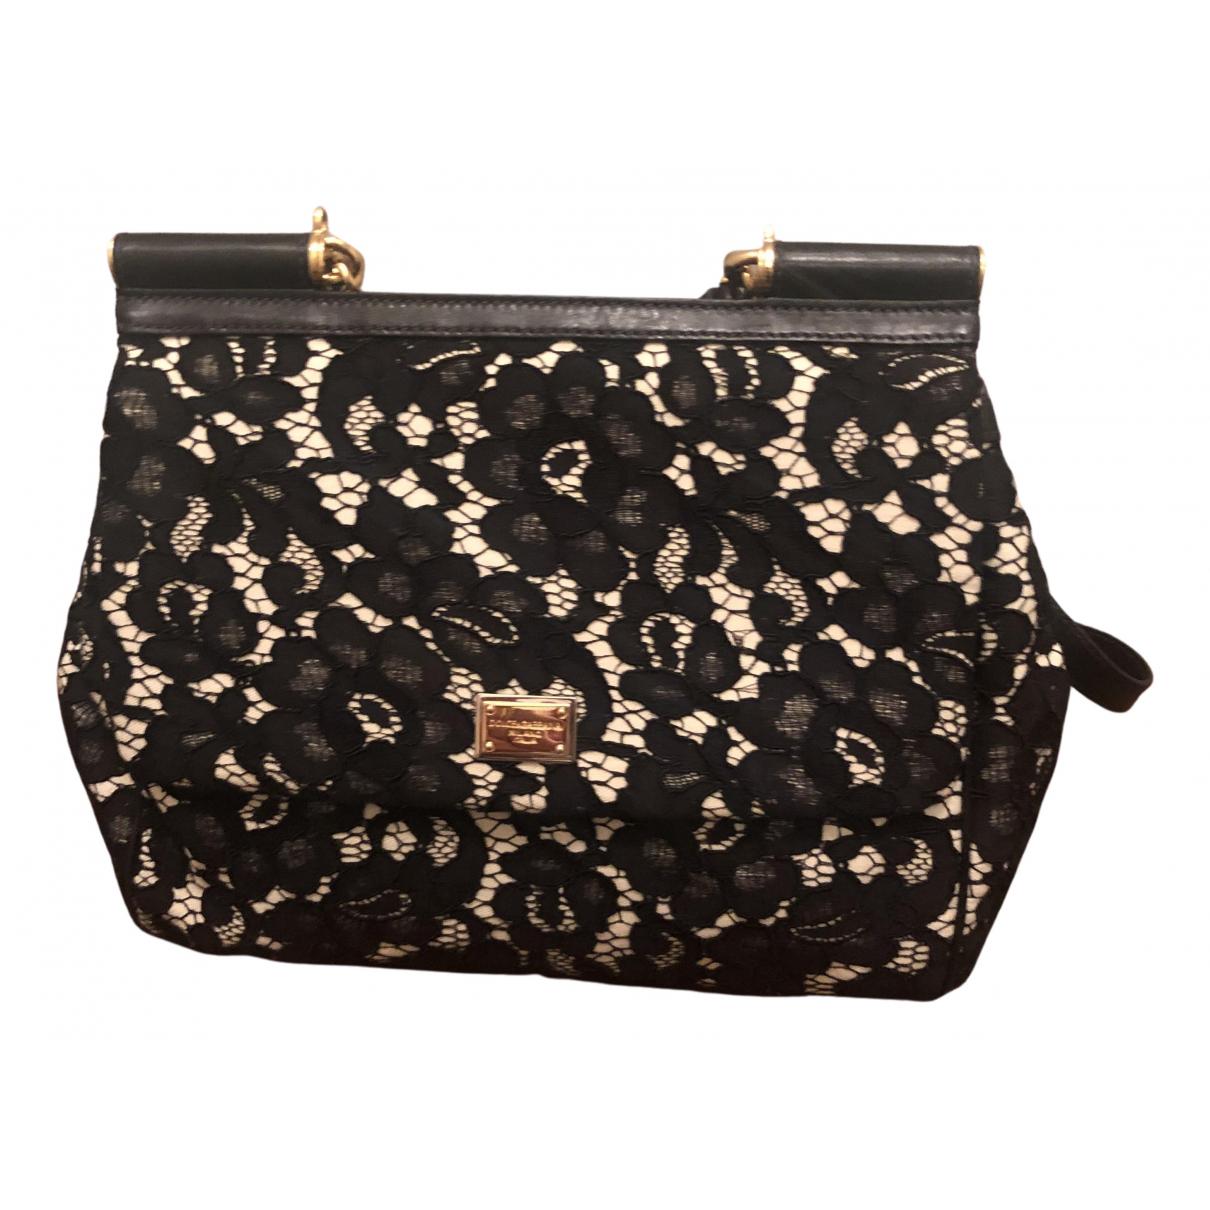 Dolce & Gabbana Sicily Black Cloth handbag for Women N